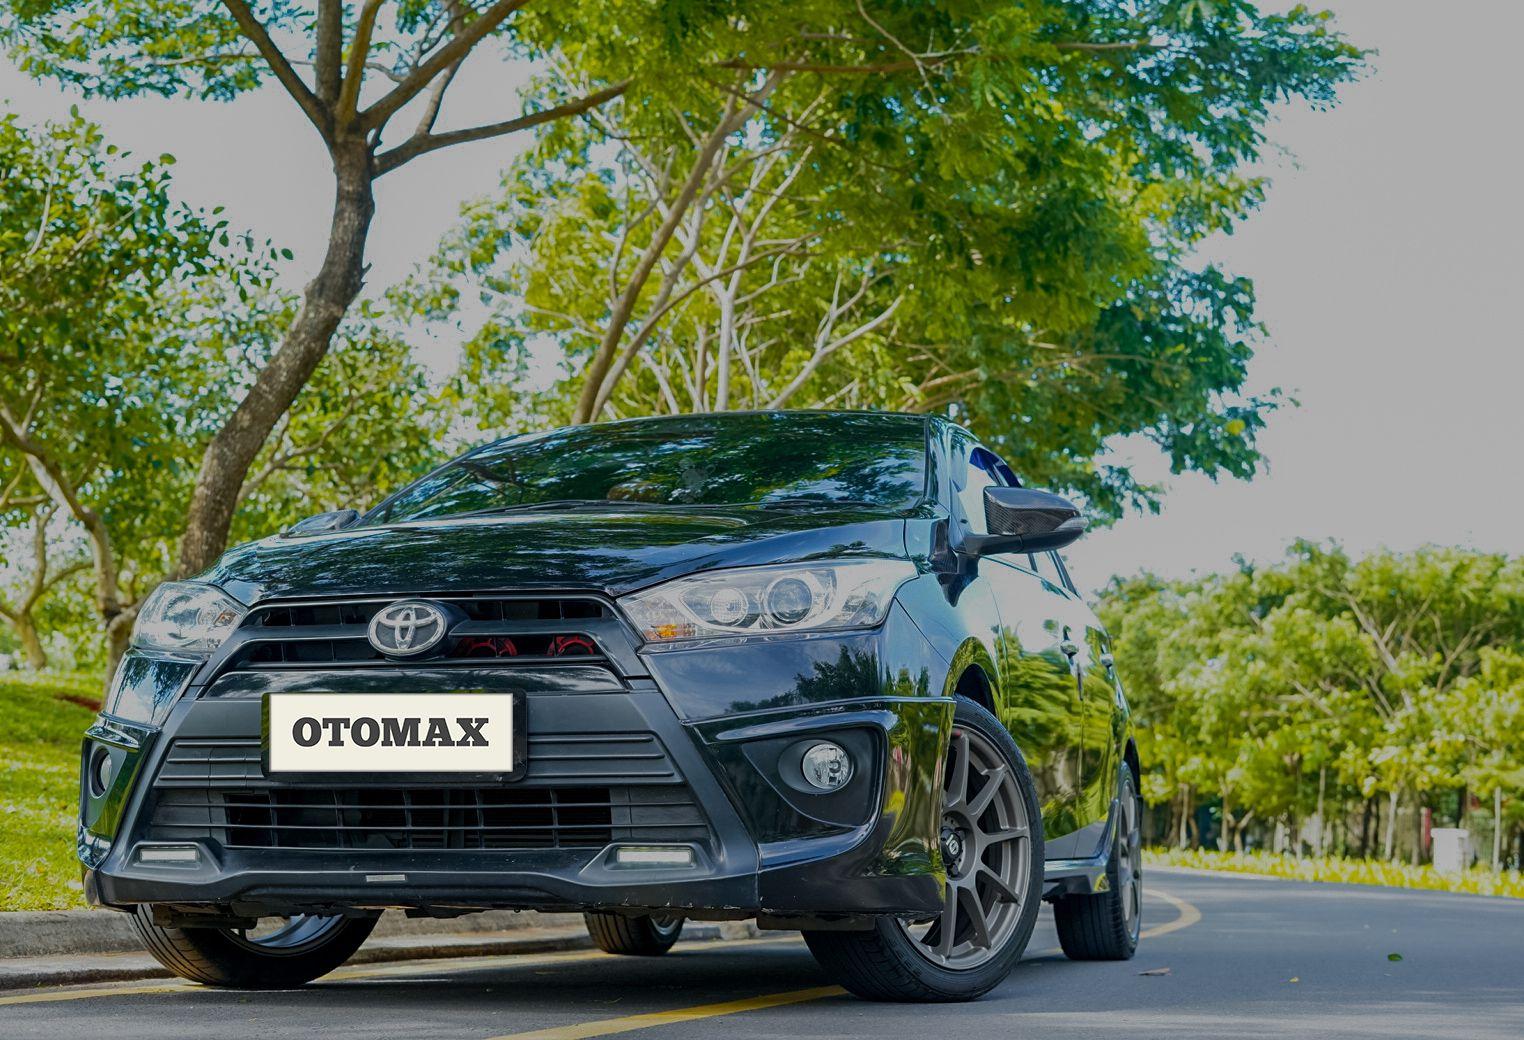 Mobil Toyota Yaris Modifikasi Terbaru Yaris Toyota Bmw Car